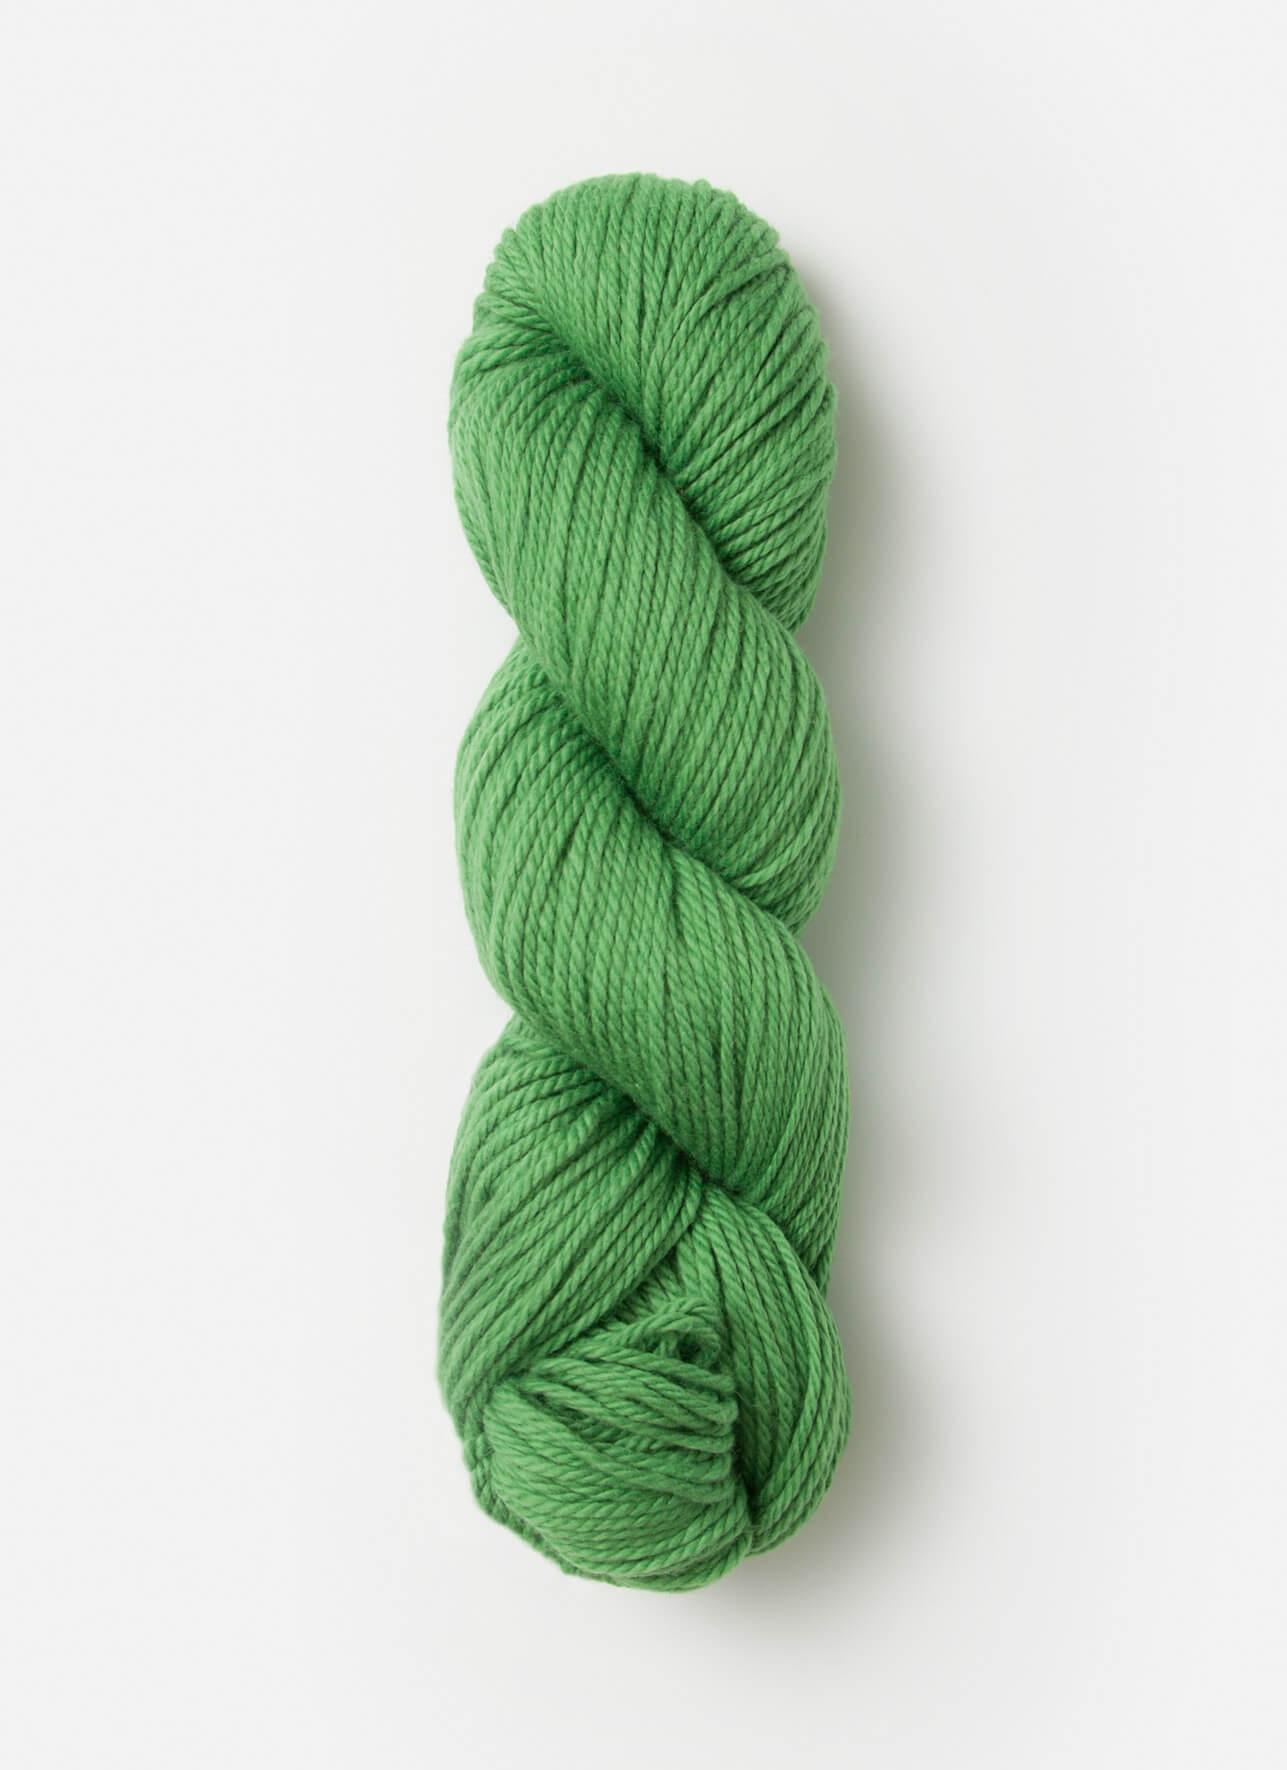 No. 7514: Turtle